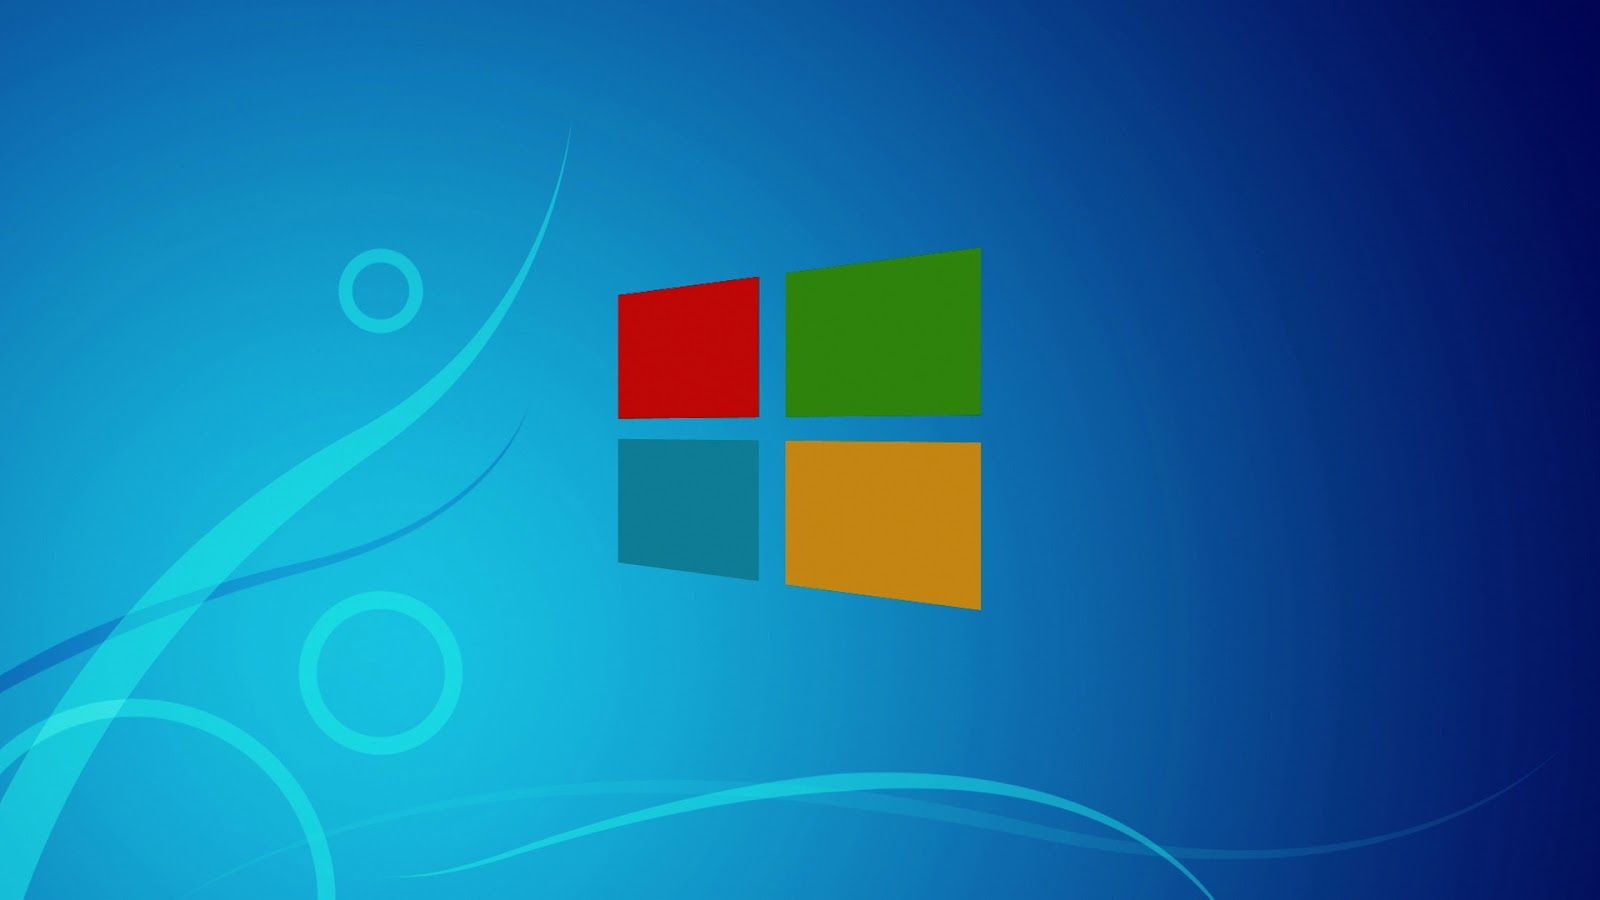 1080p Windows 10 Hd - HD Wallpaper